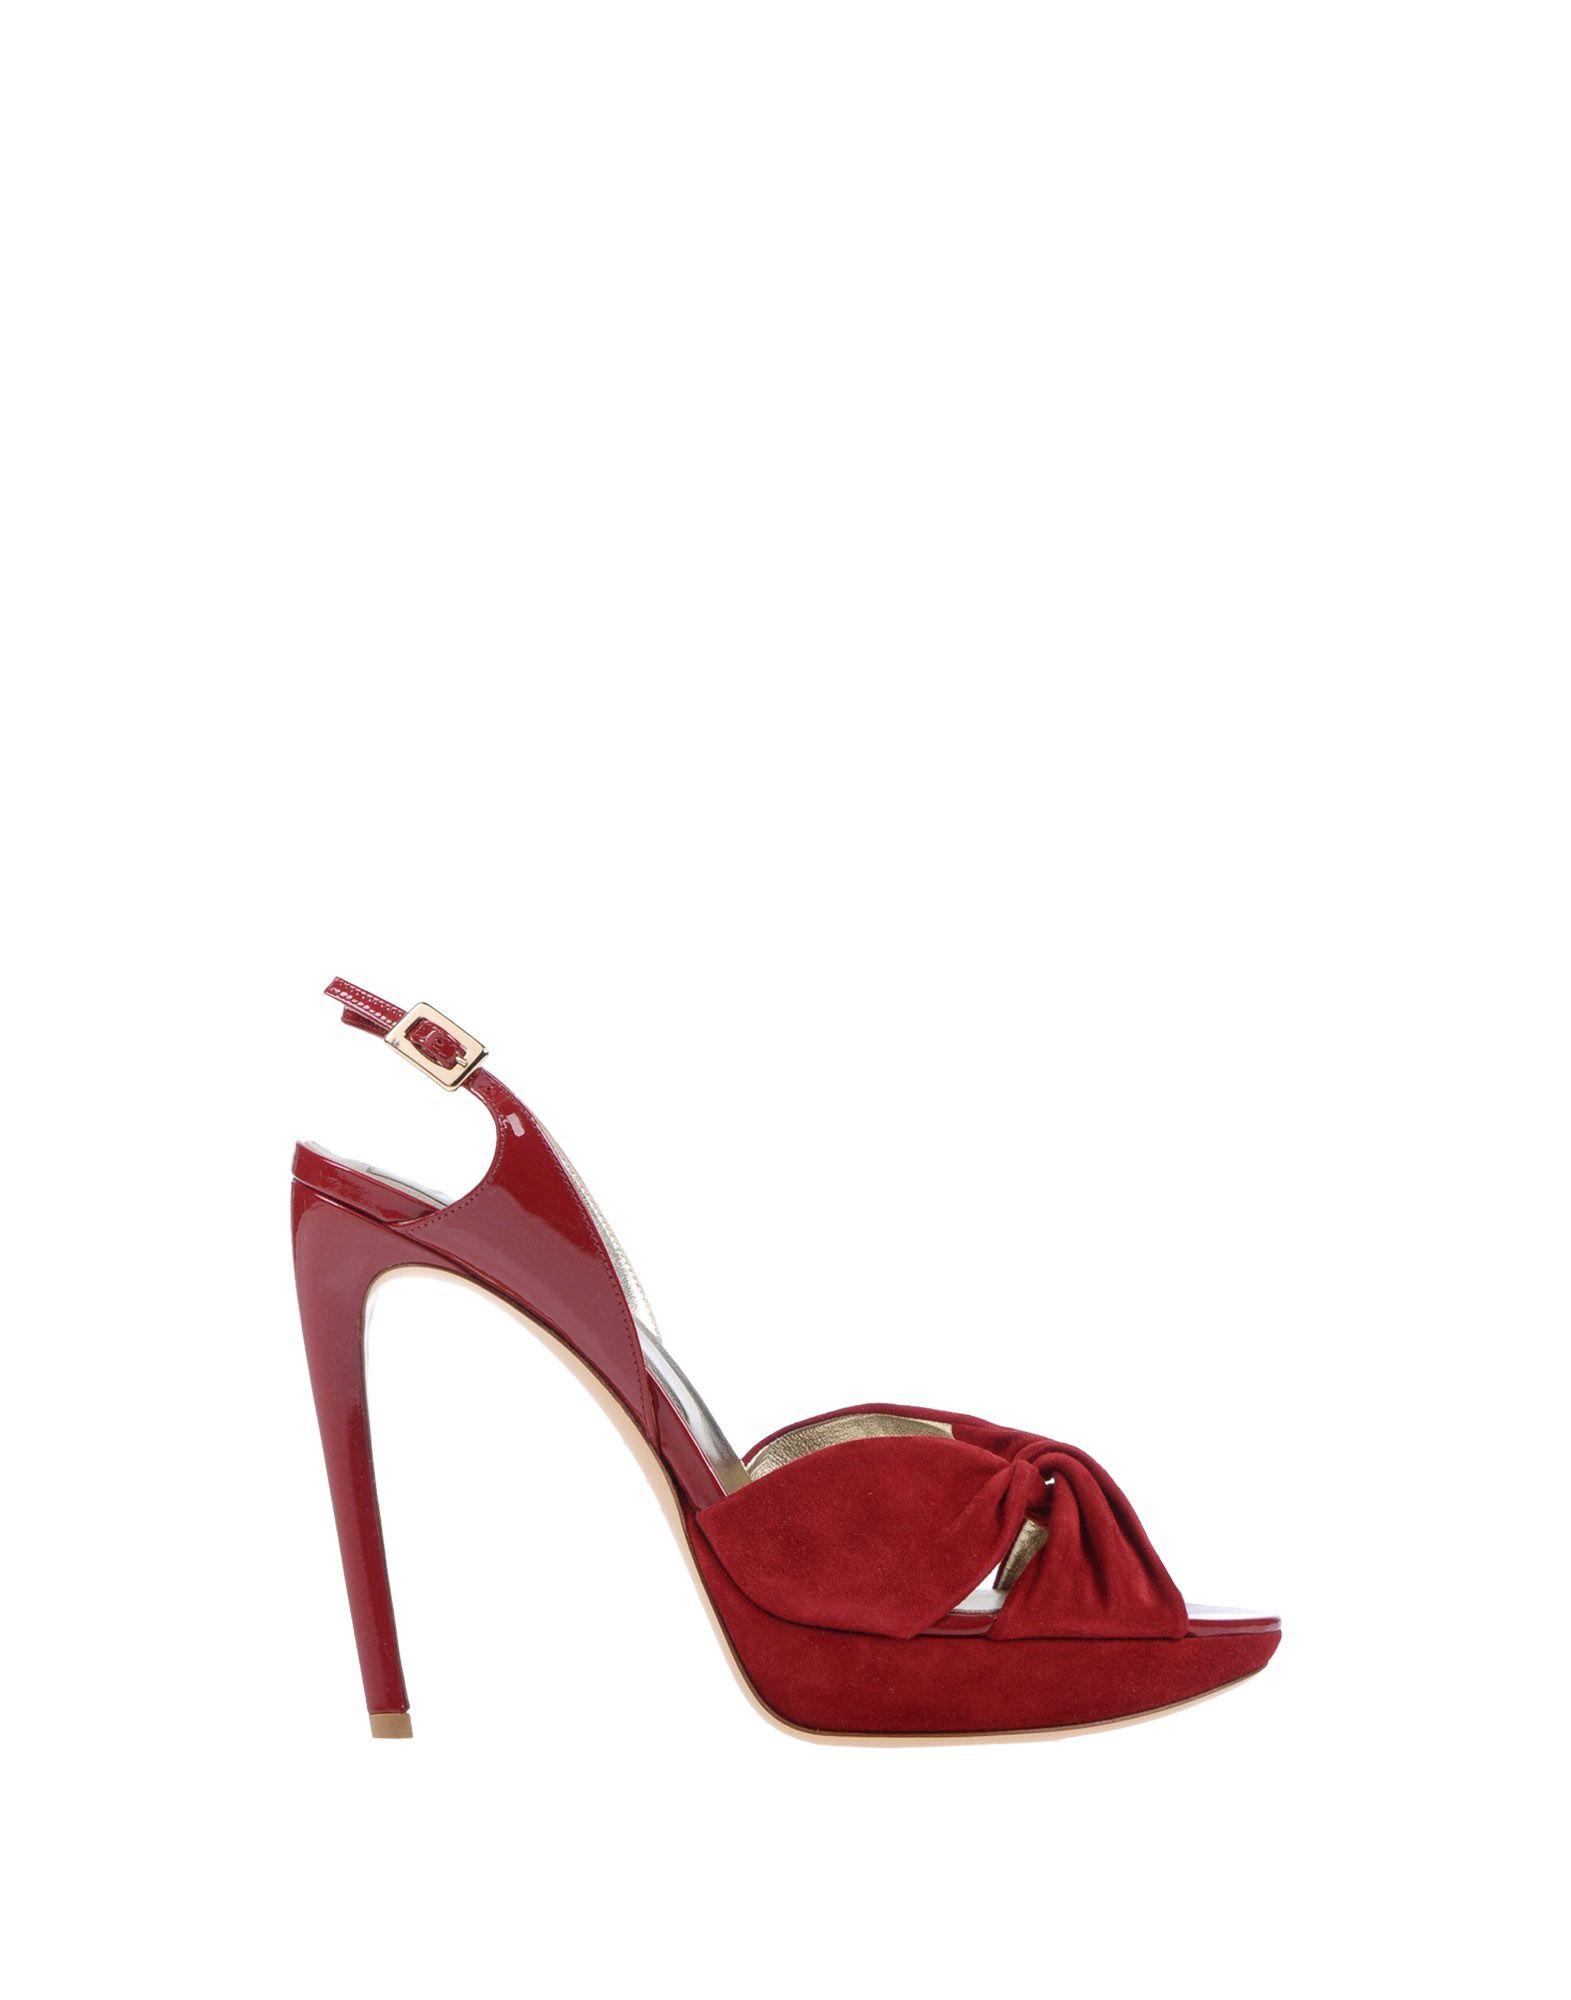 Roger Vivier Sandalen Damen Schuhe  11501694OTGünstige gut aussehende Schuhe Damen 335bee